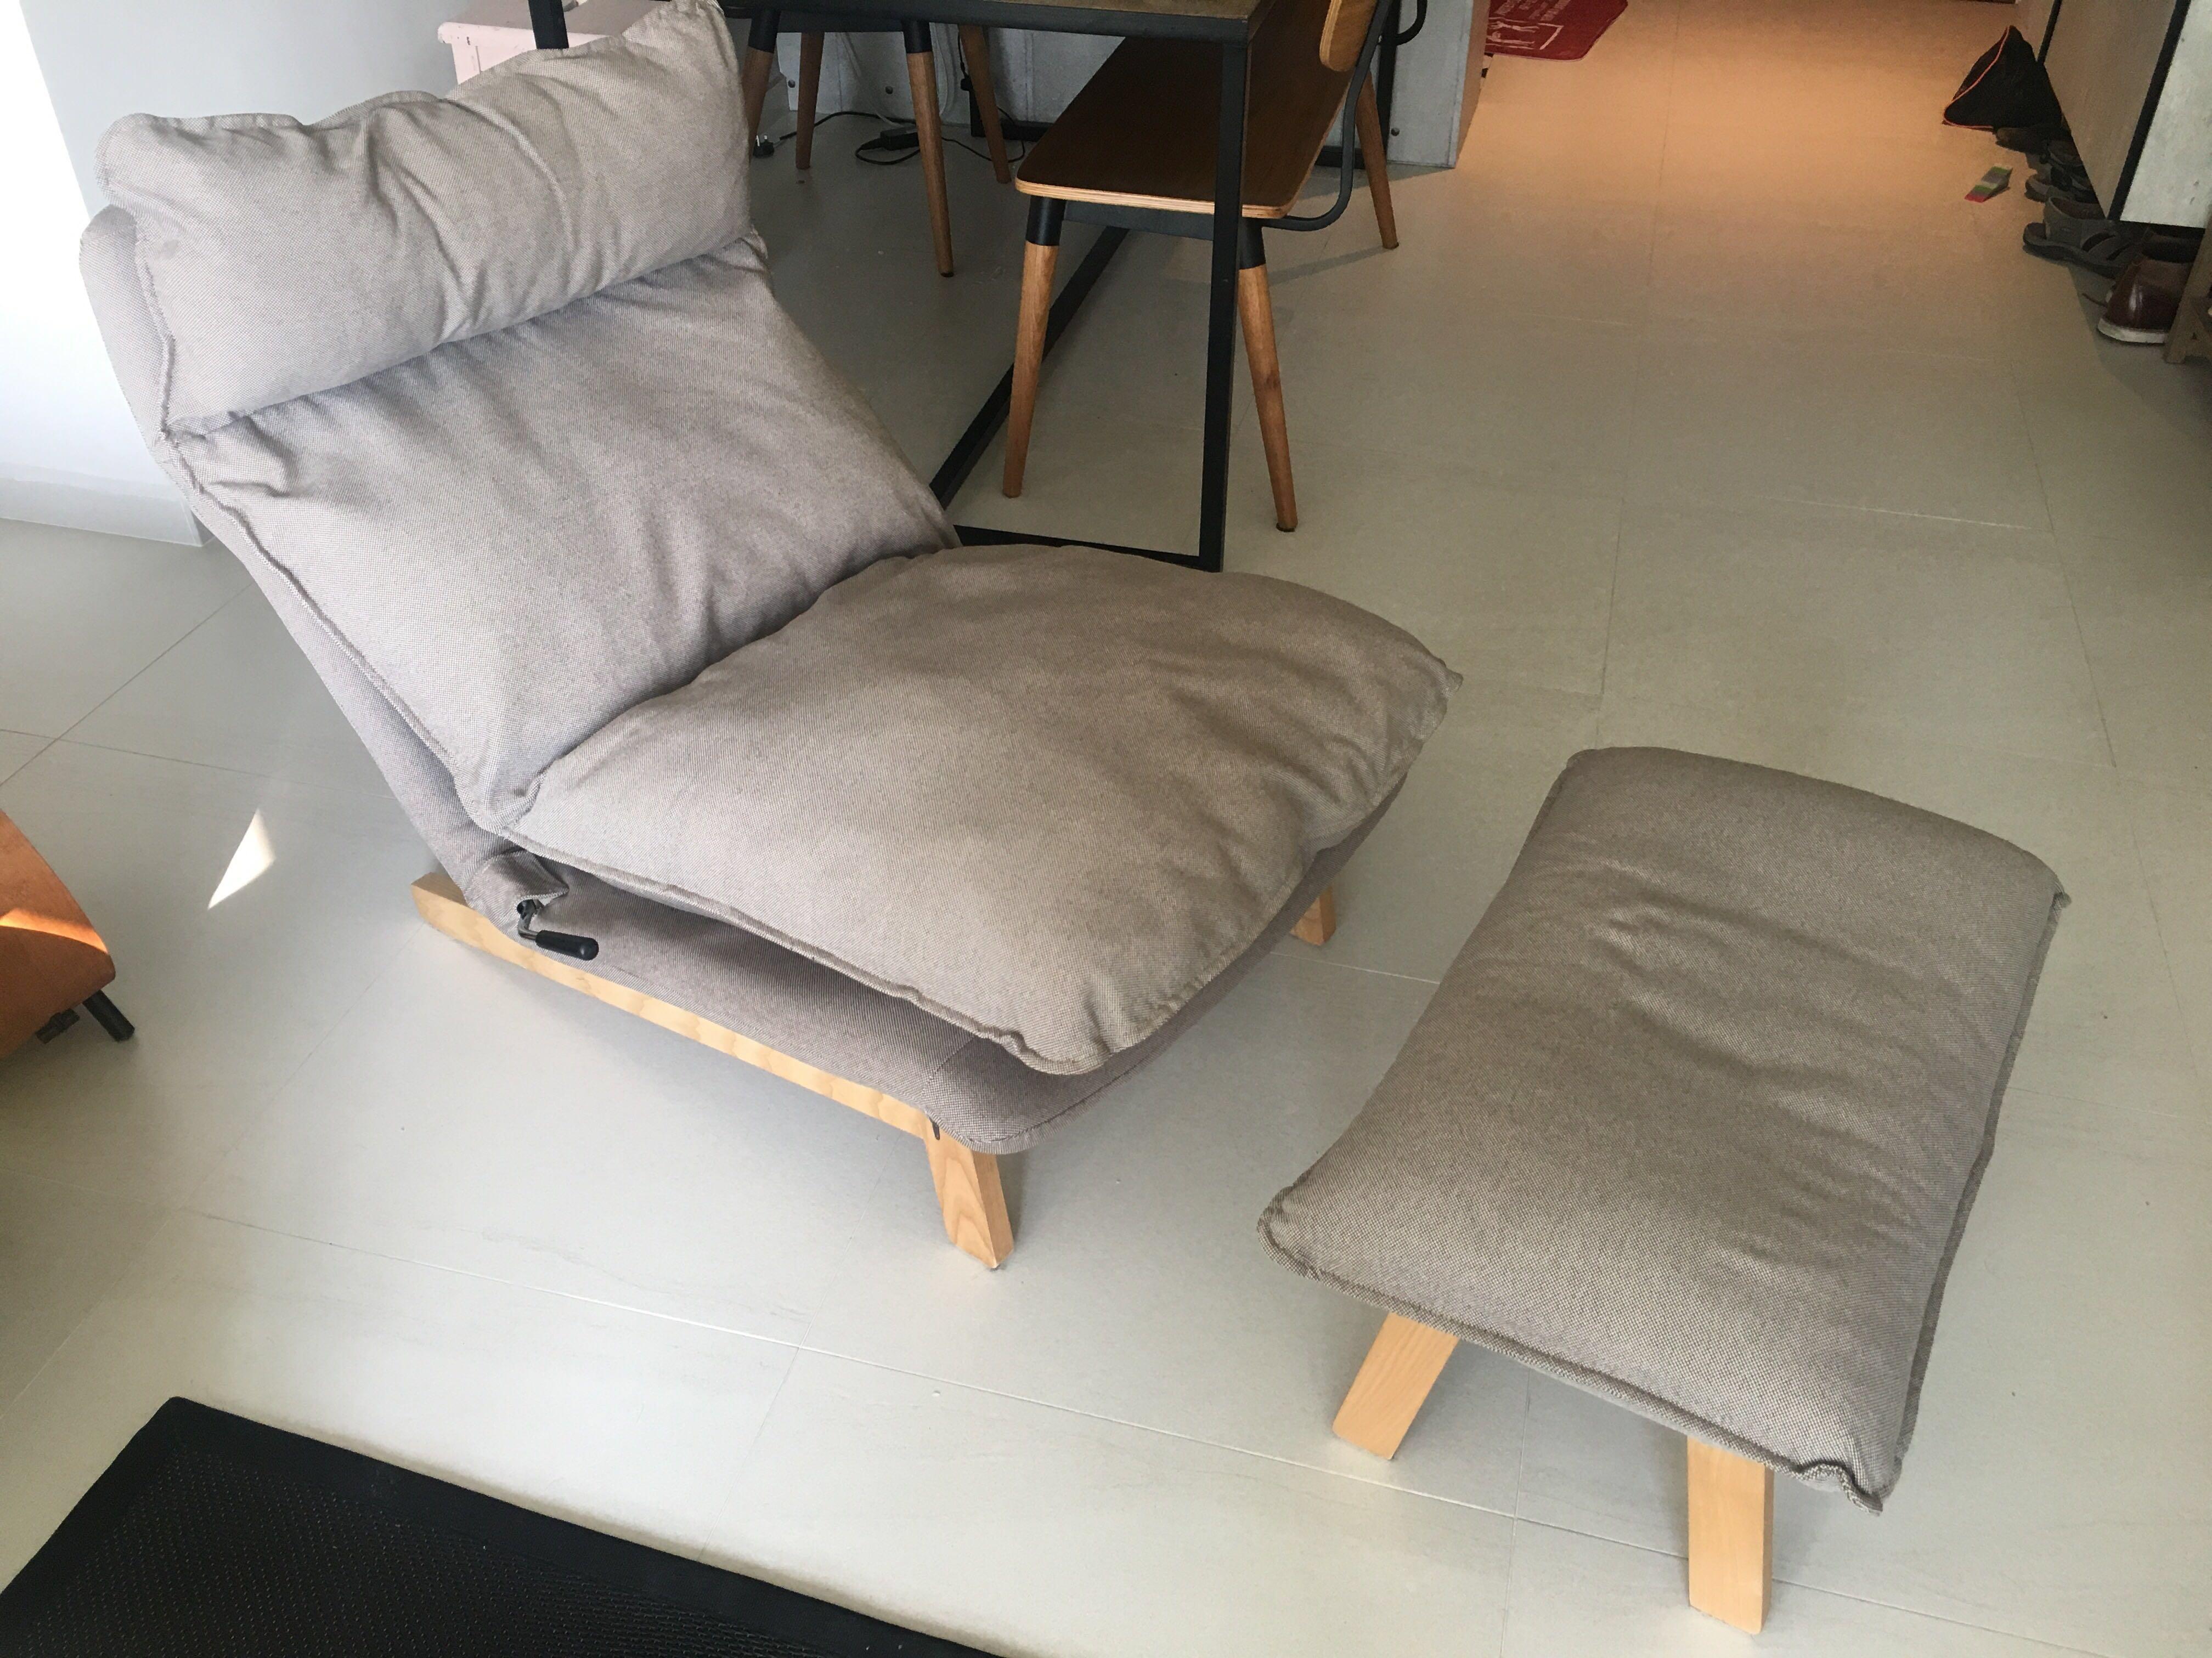 Tremendous Muji Highback Reclining Sofa With Ottoman Furniture Sofas Evergreenethics Interior Chair Design Evergreenethicsorg